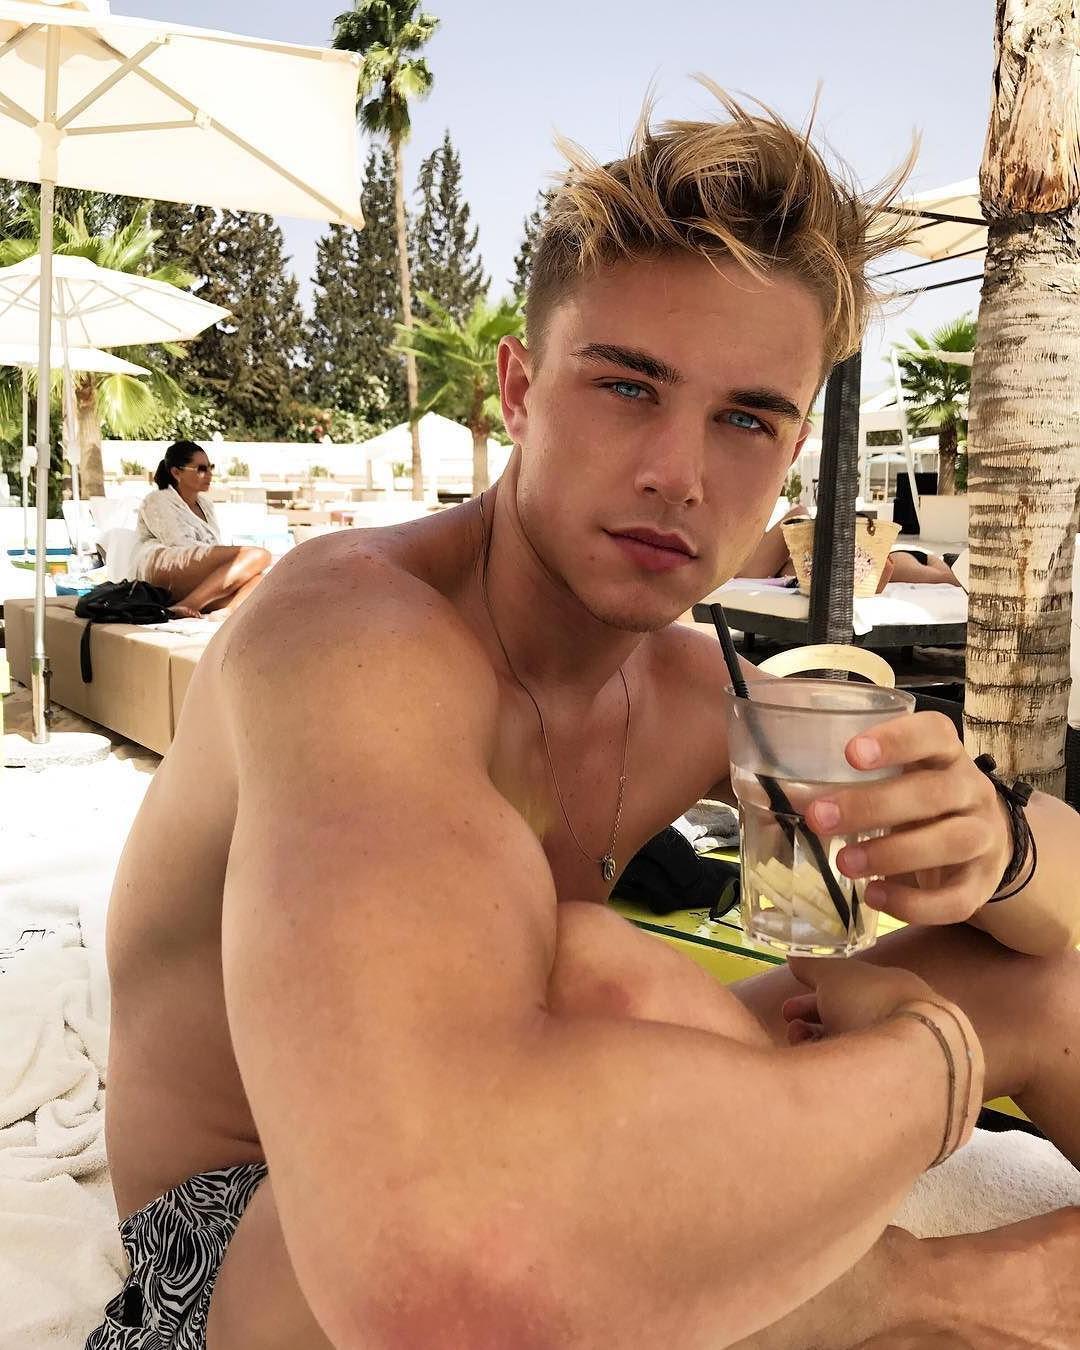 lusty-blond-twinks-sensual-blue-eyes-gay-guys-vacation-cutie